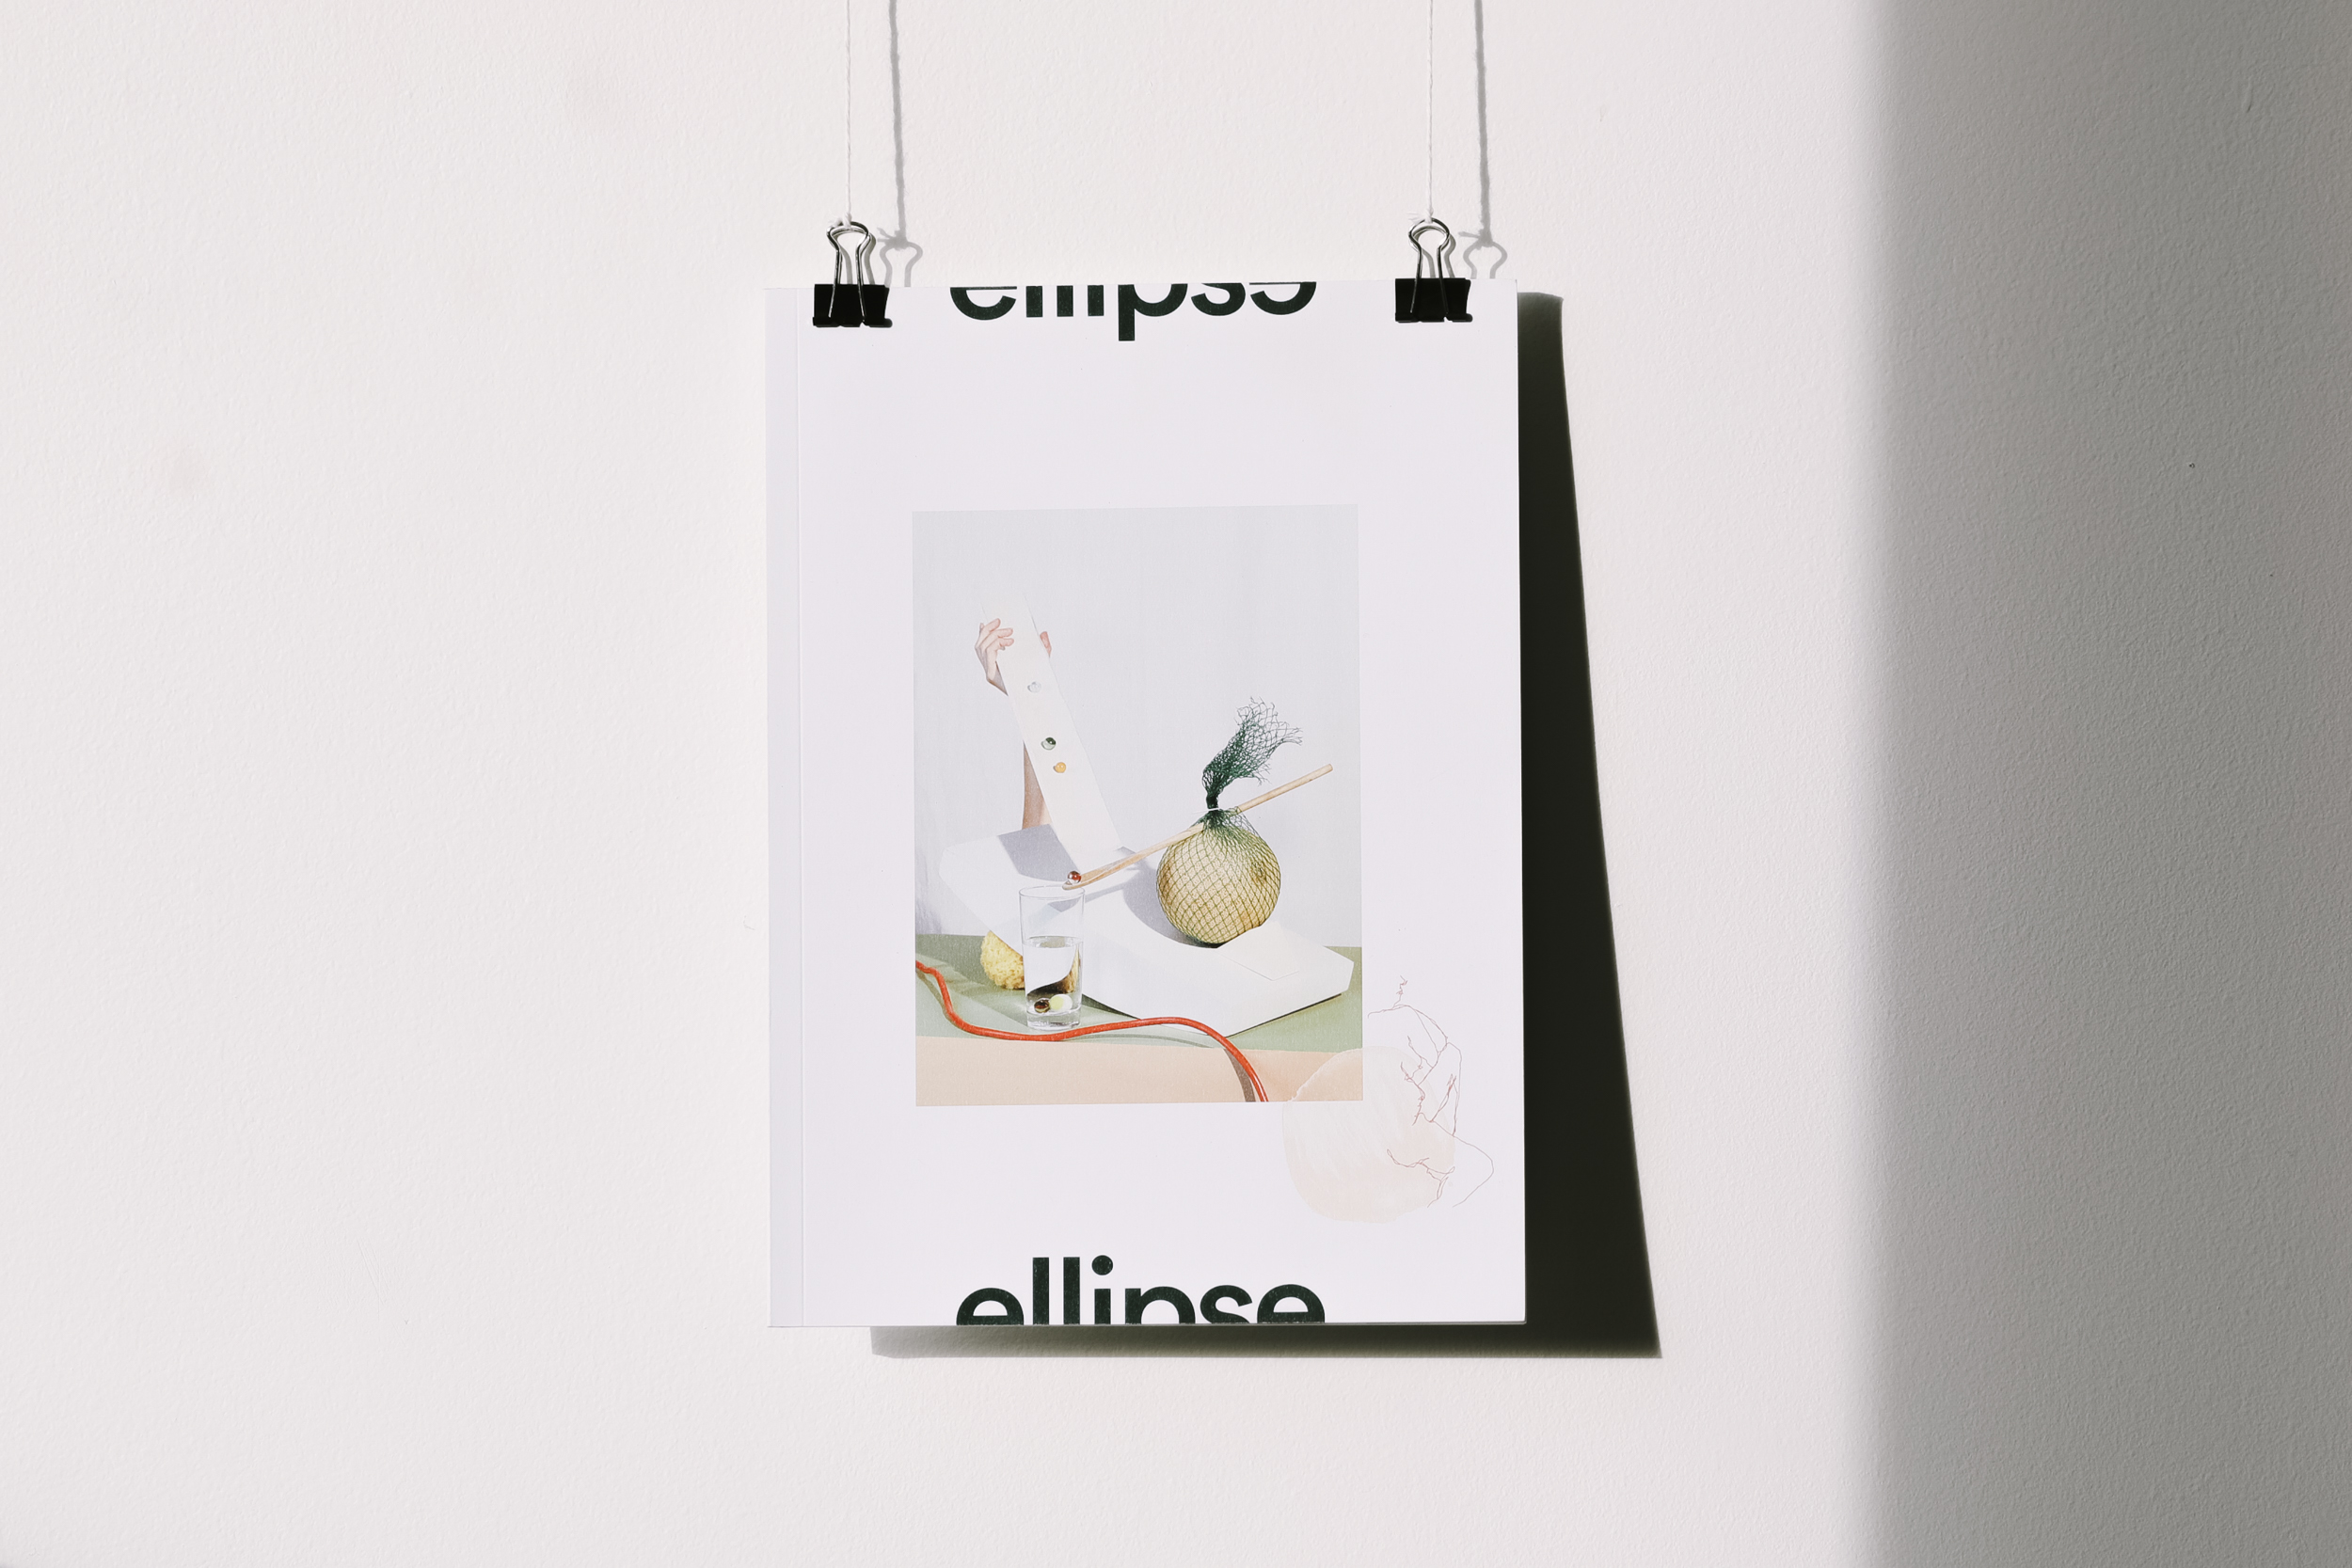 ellipsemag_001.jpg